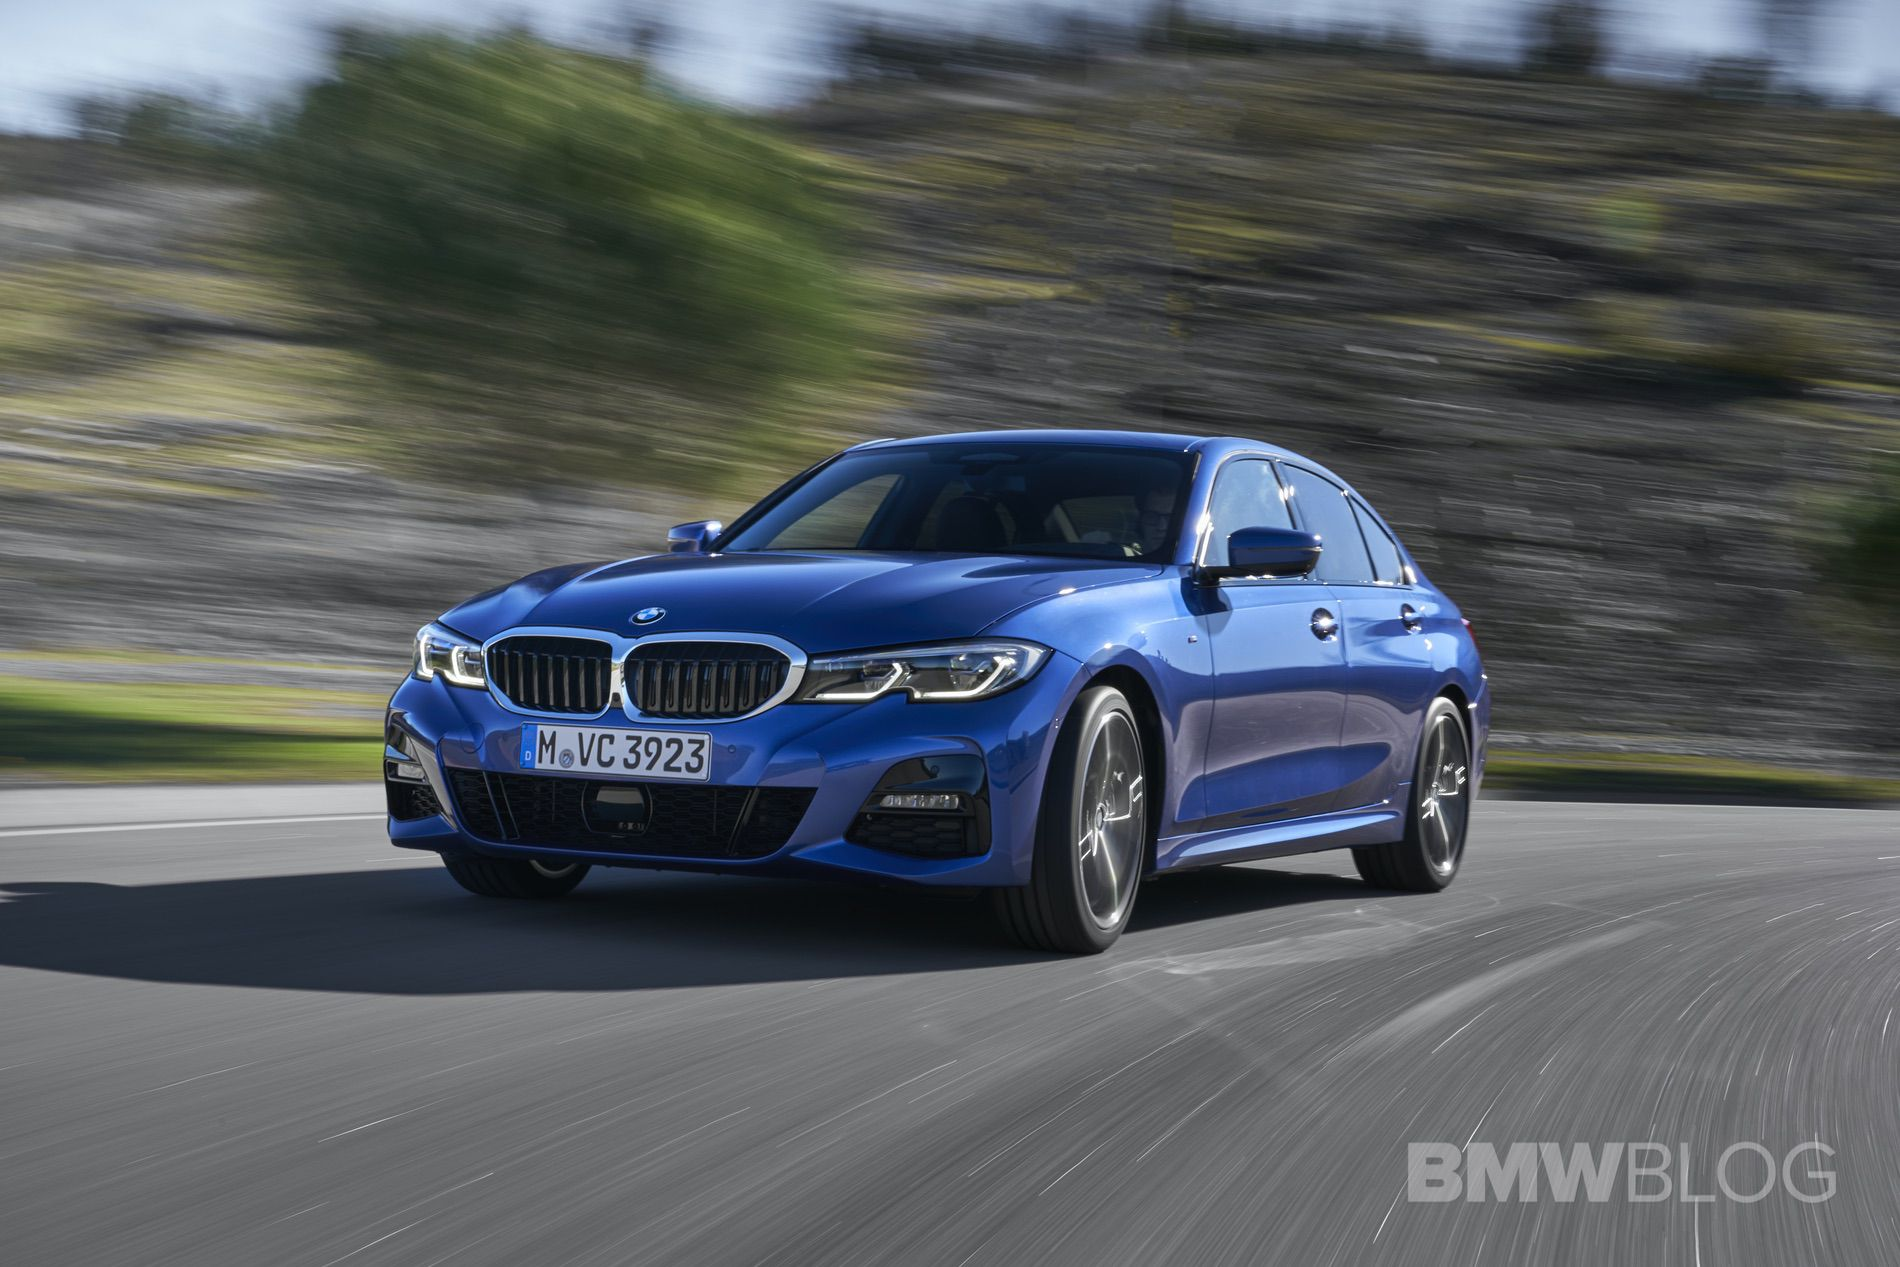 2019 BMW 330 G20 test drive 37